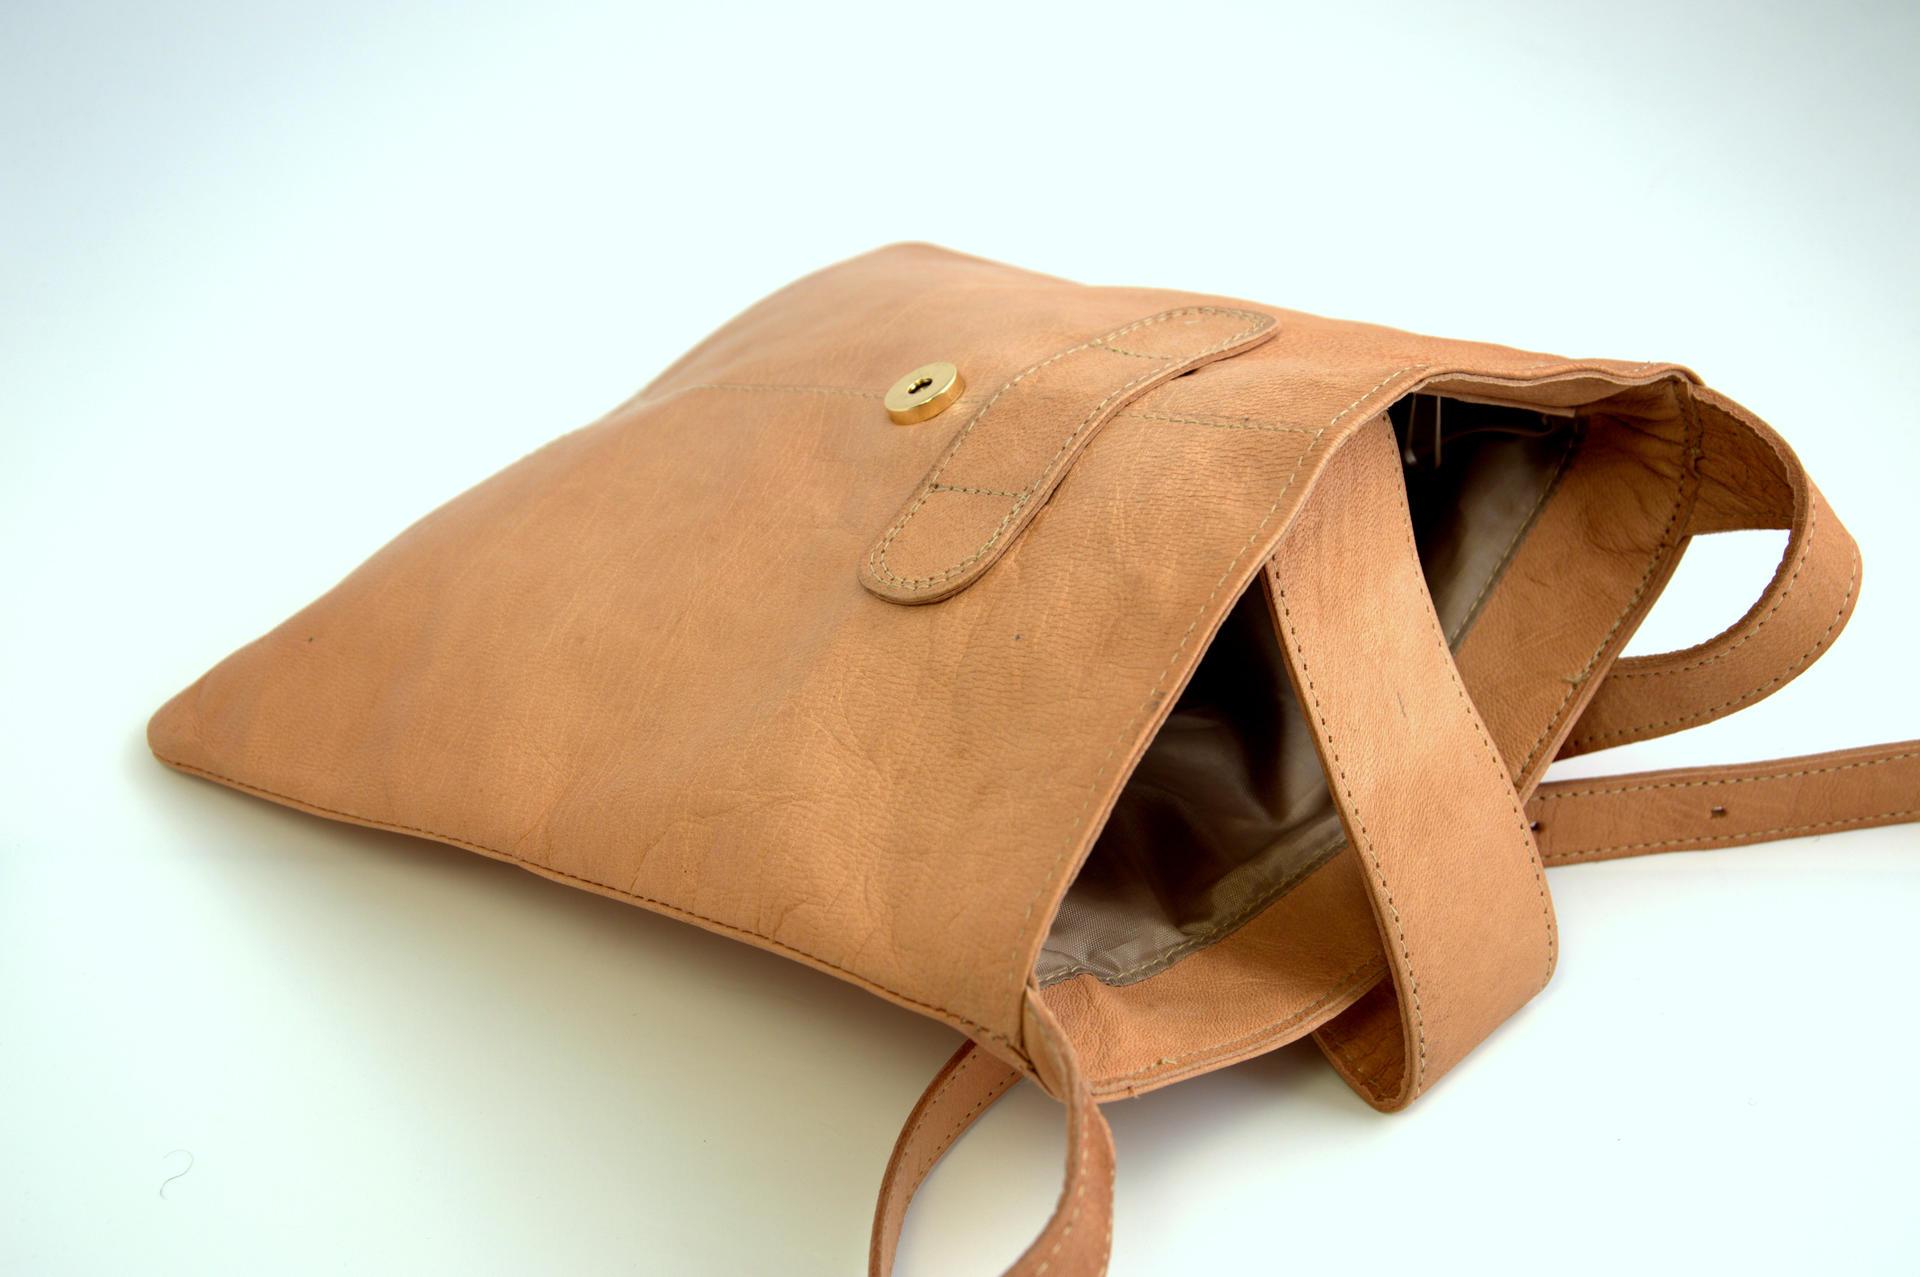 Gundara - genuine leather - hand bag - Afghanistan - fair trade